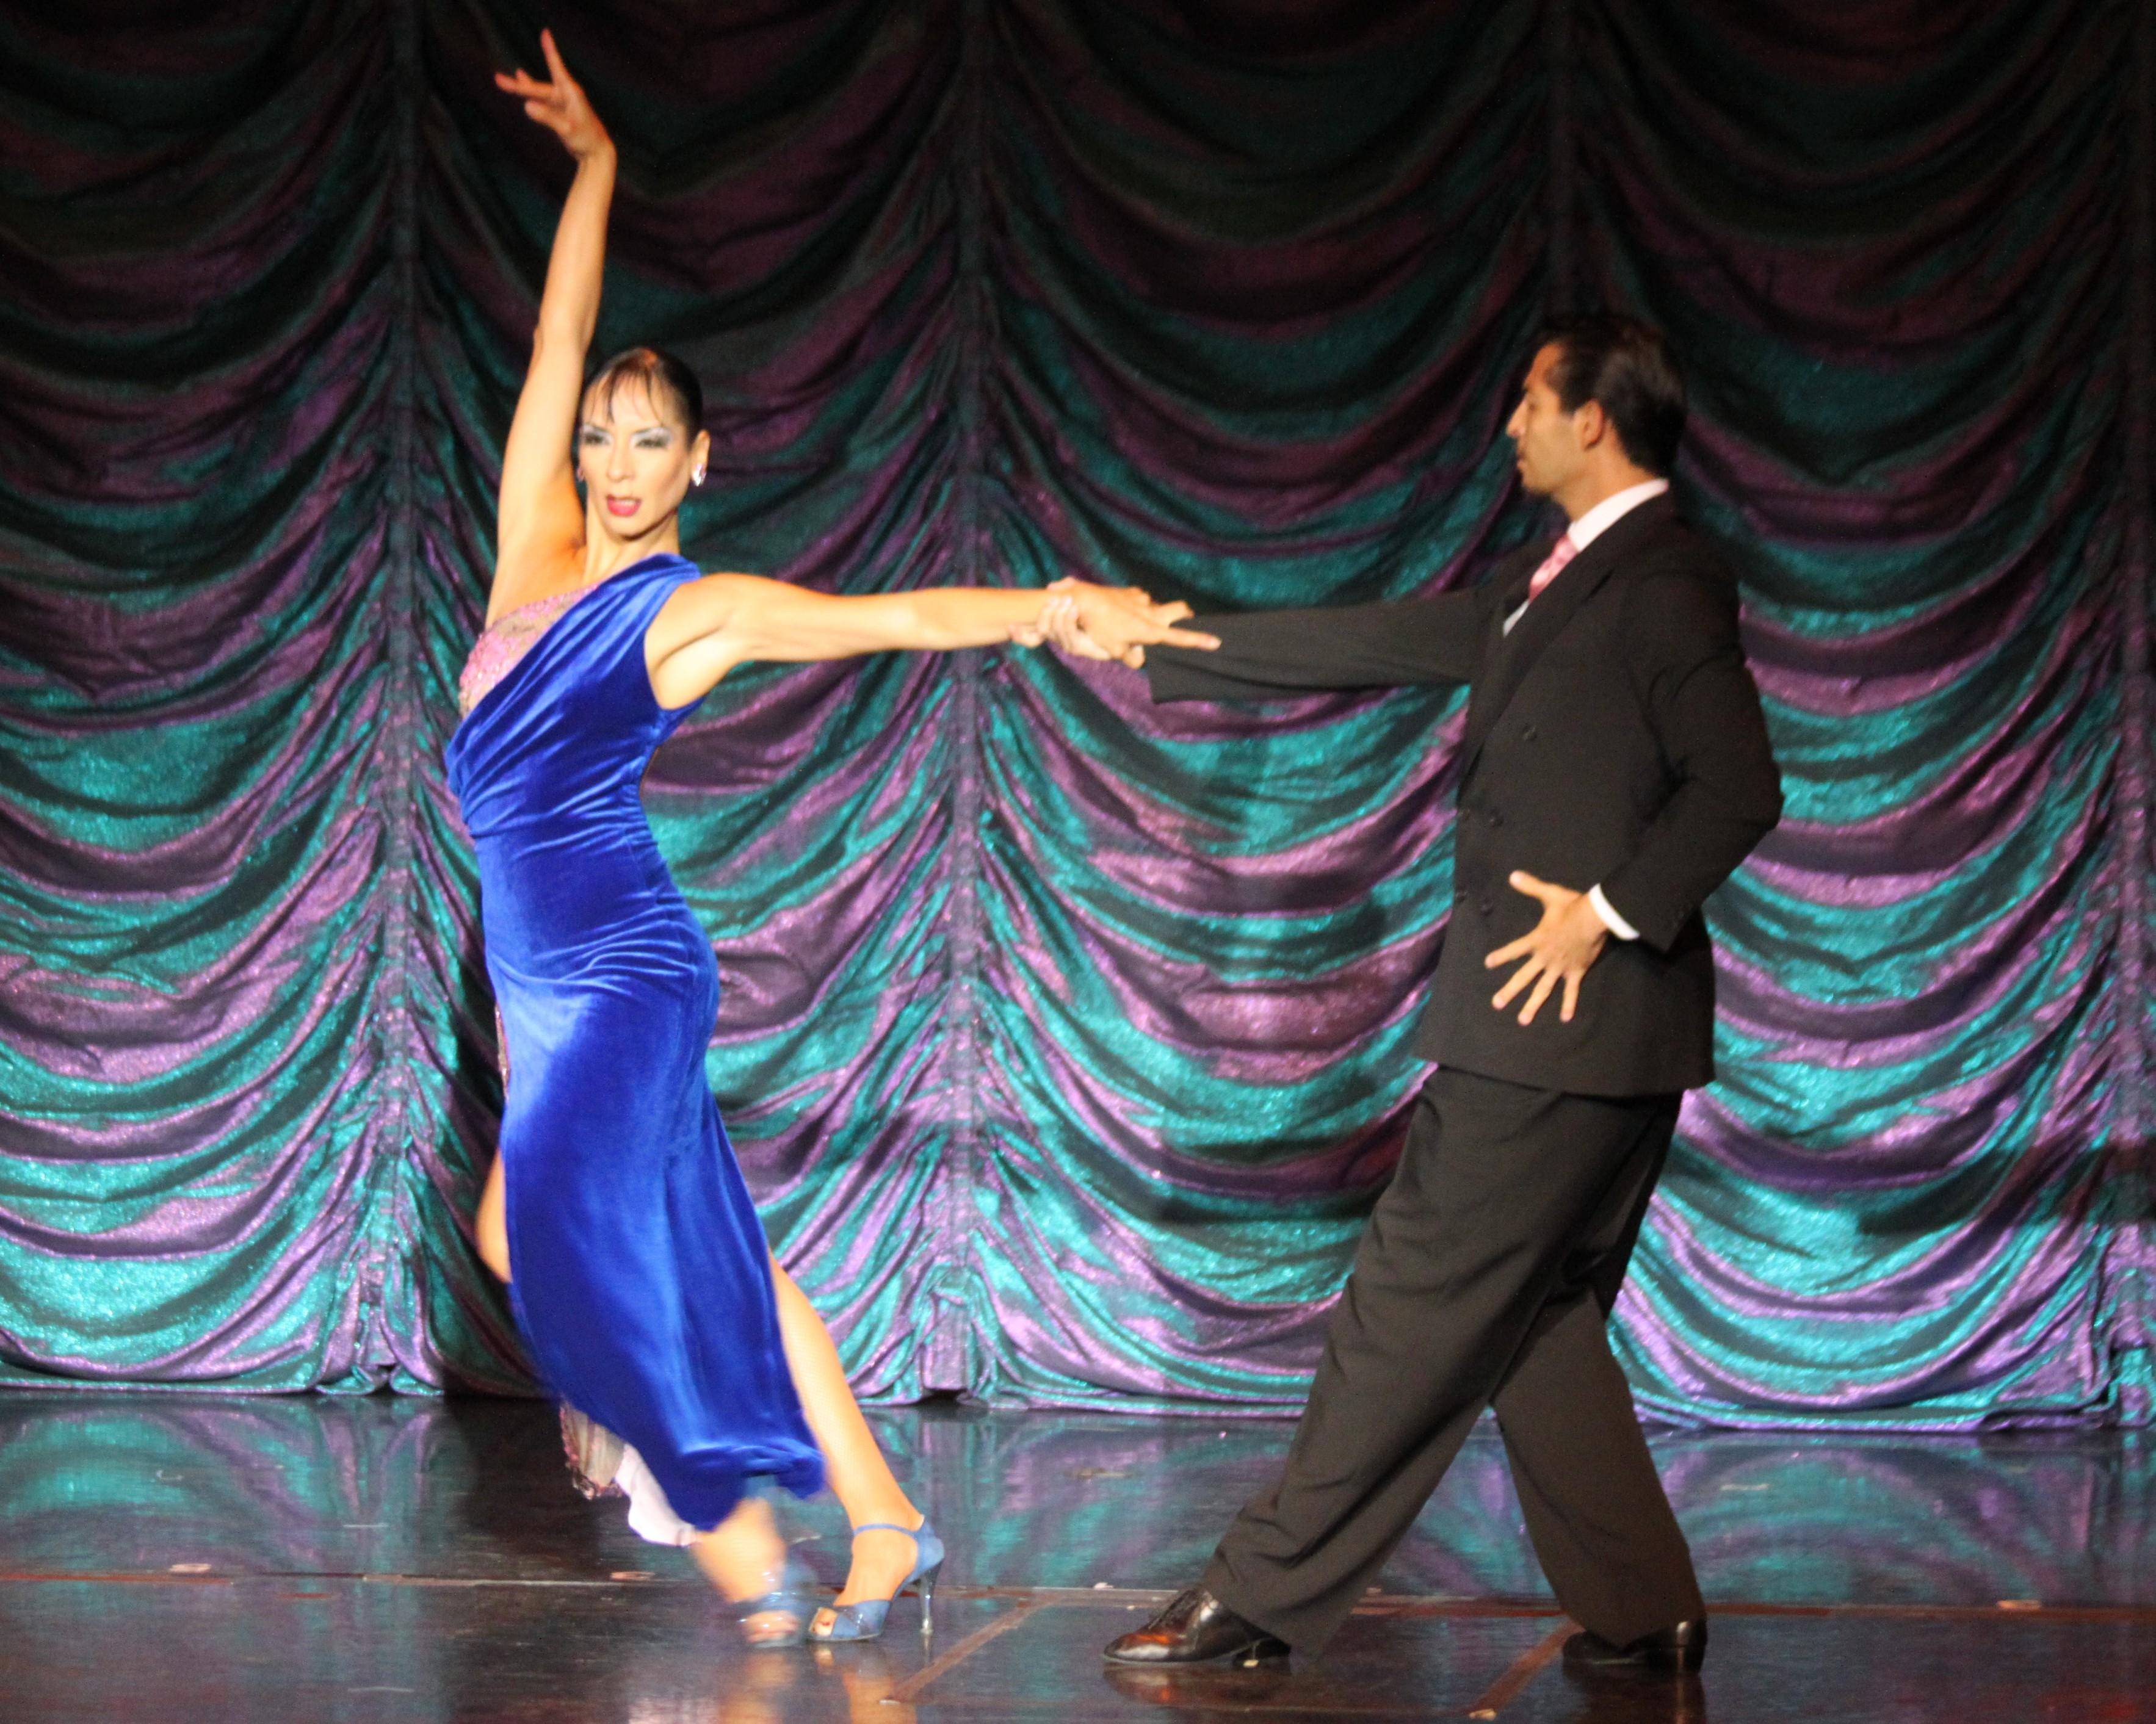 Enjoy the tango show at Piazolla